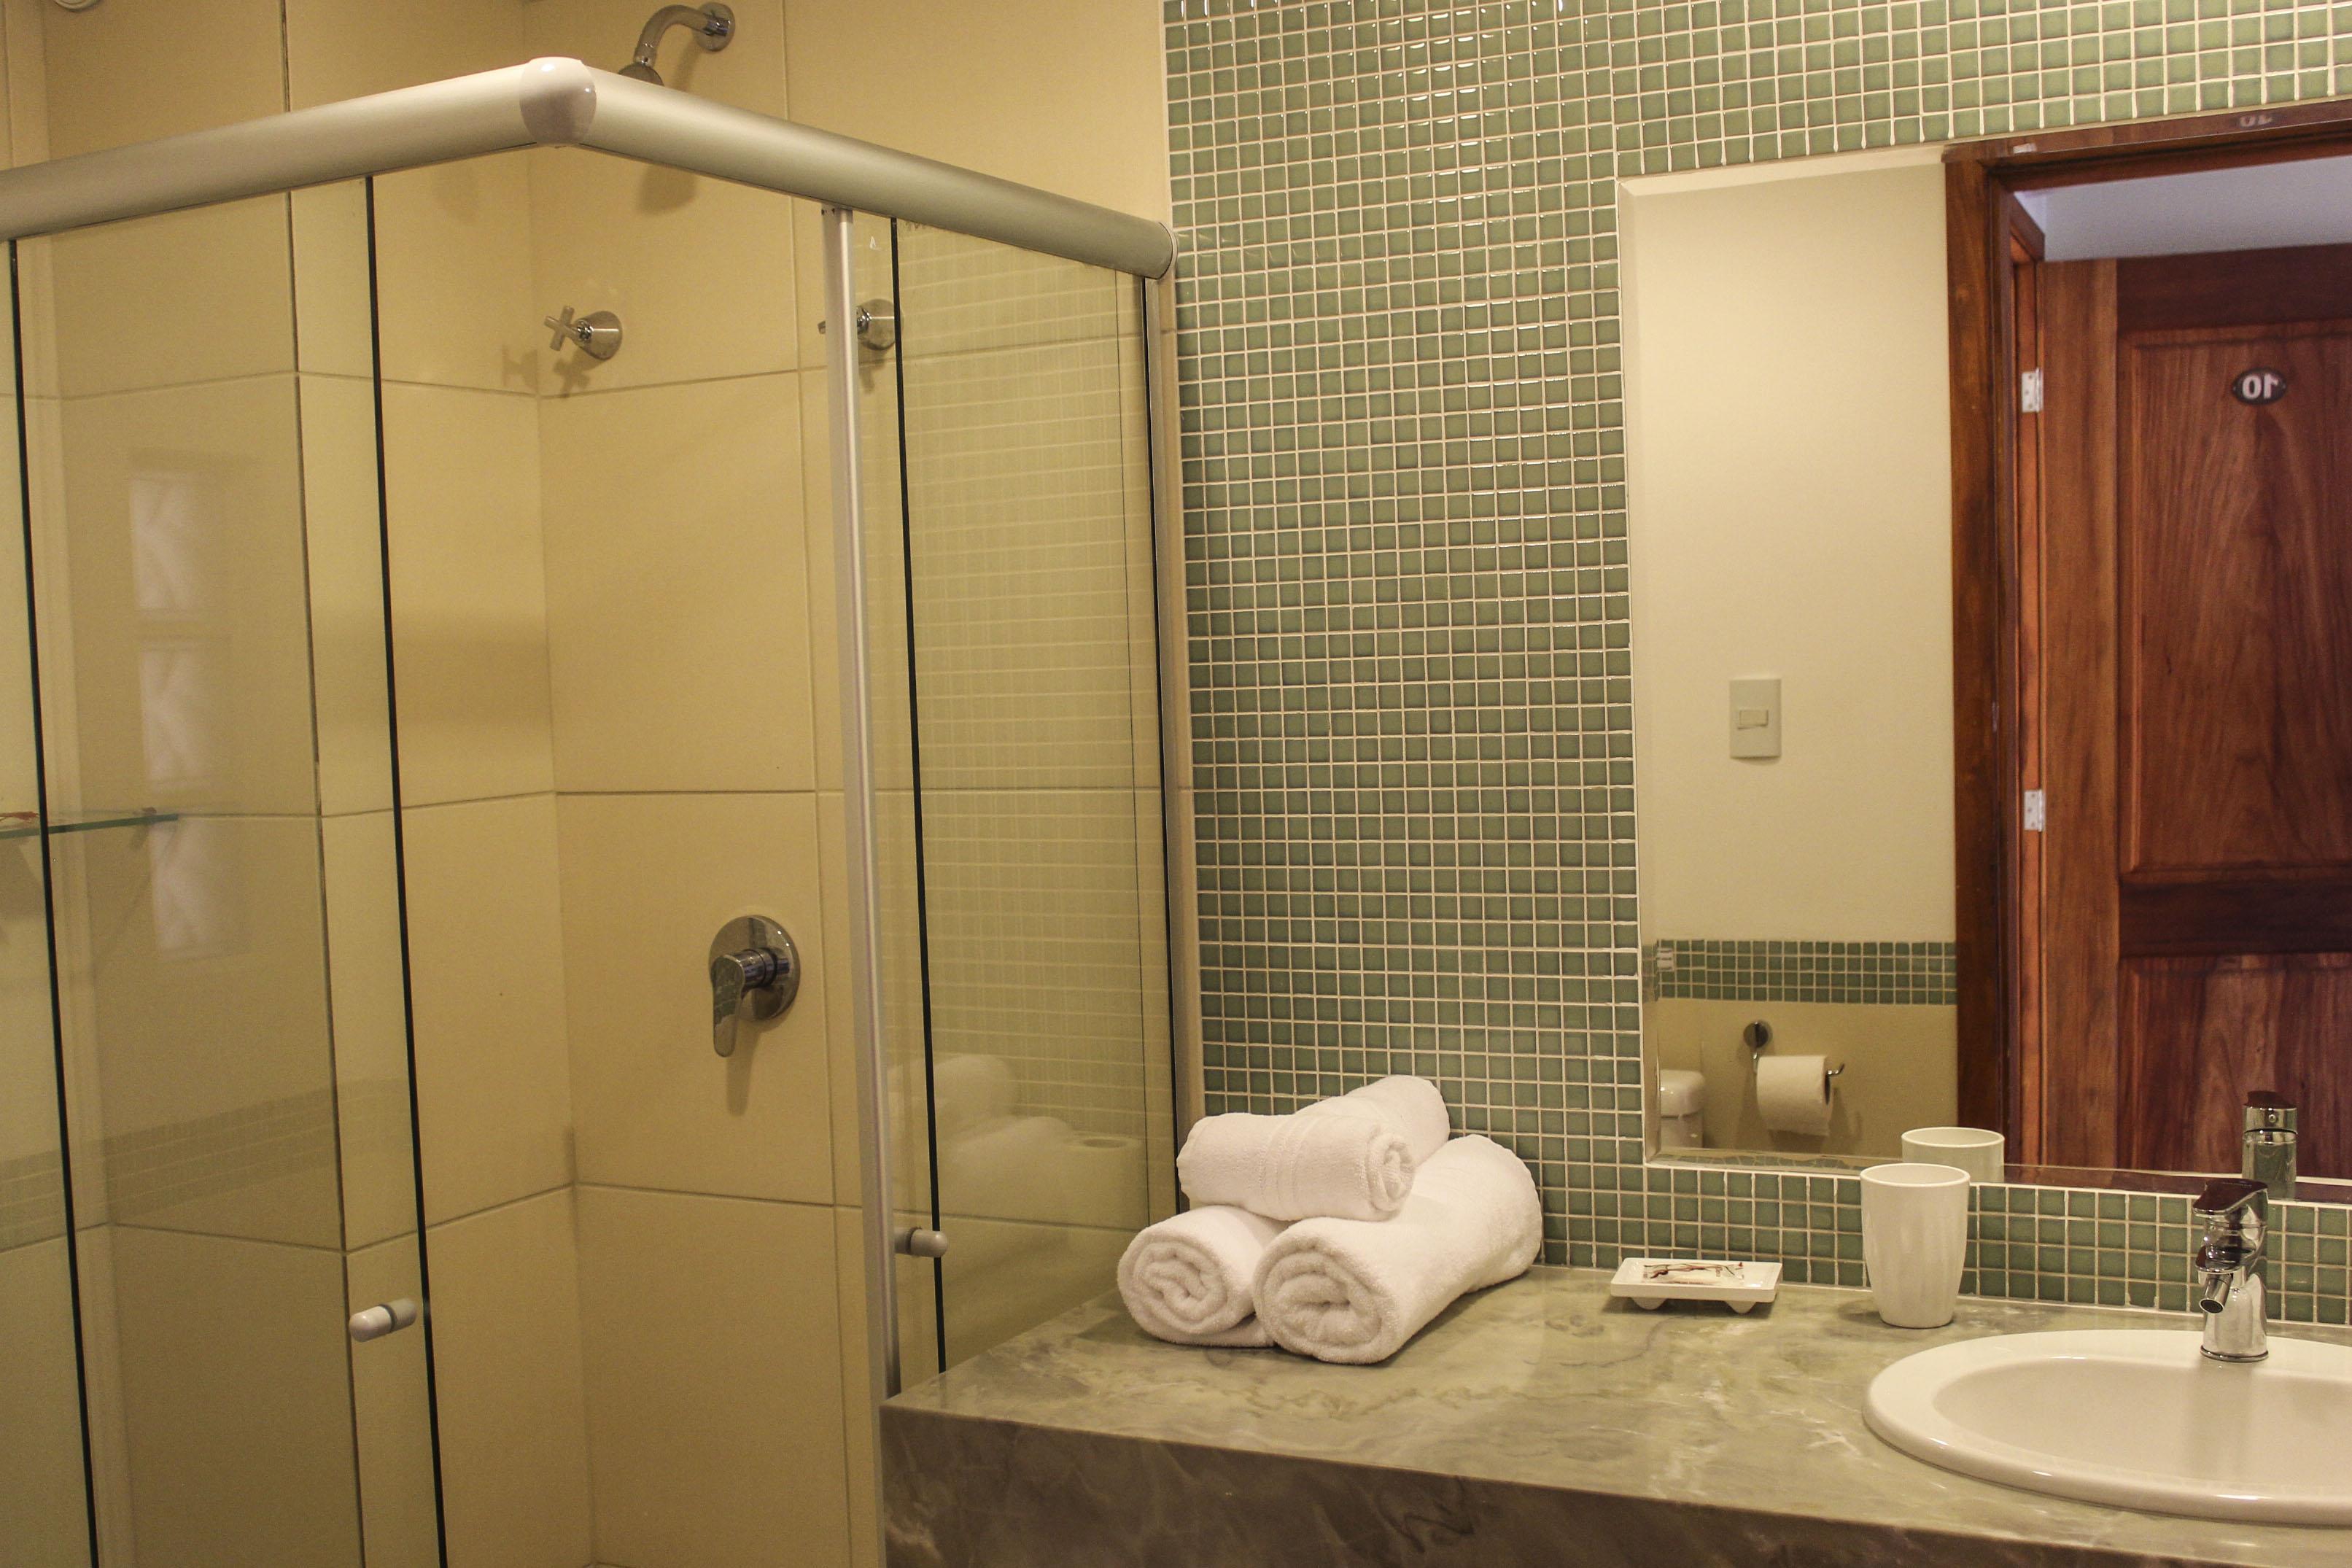 Vista Centro Banheiro - 22.07